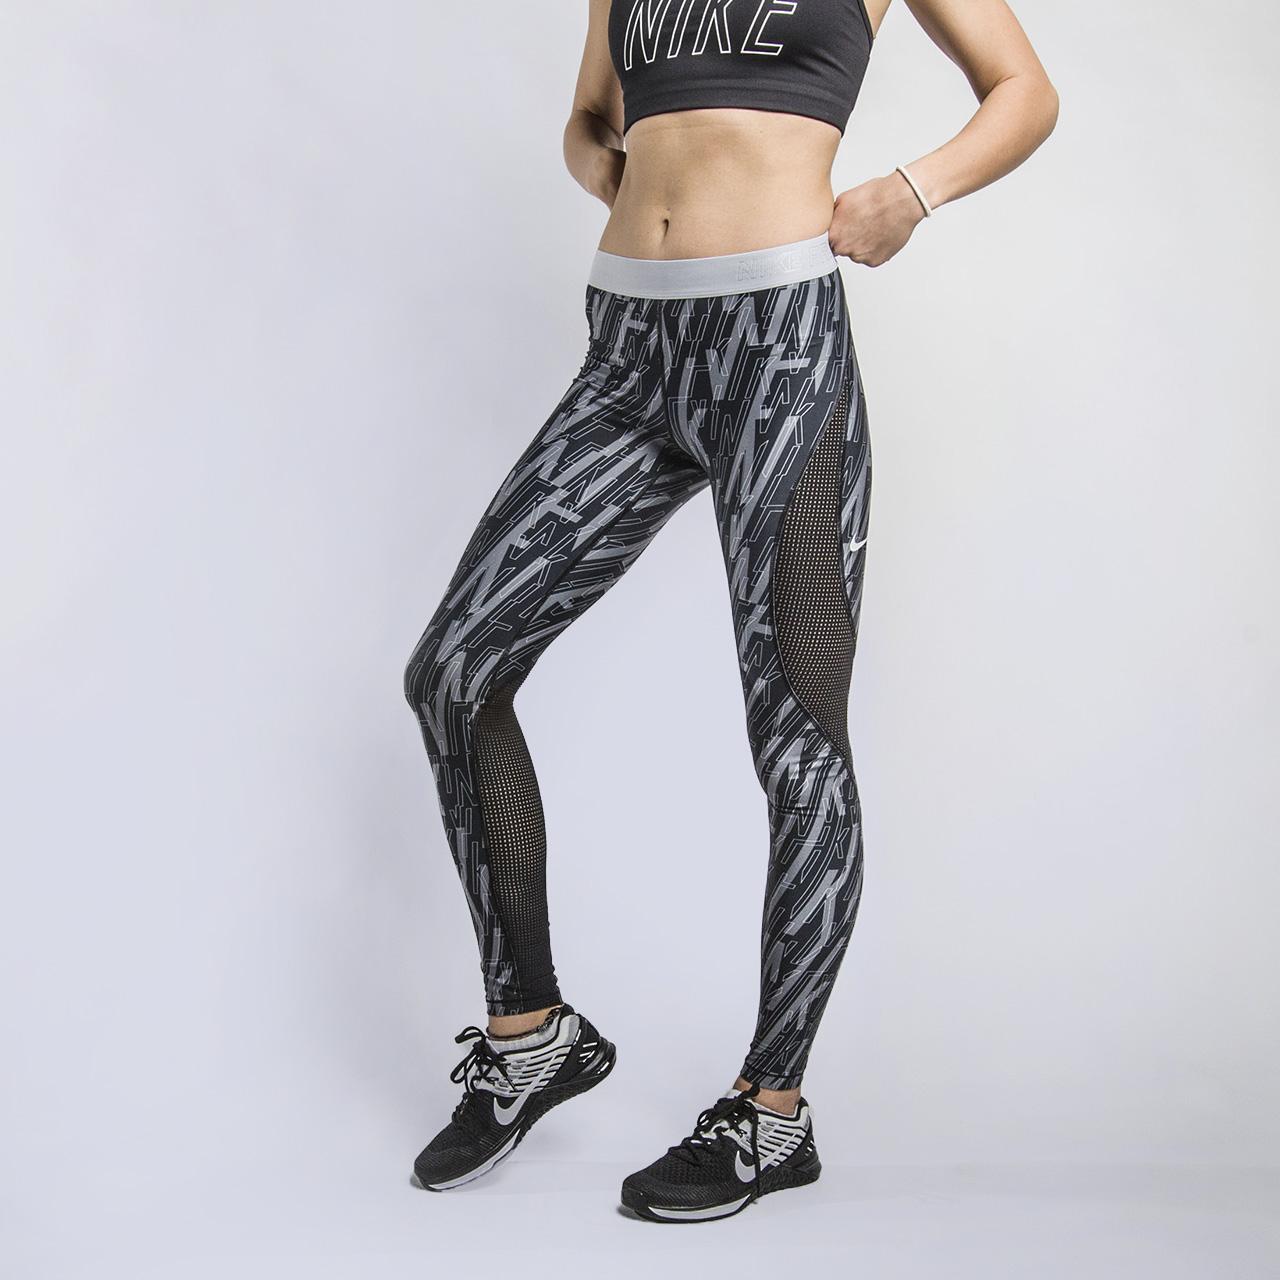 Тайтсы для тренинга Nike HyperCool Graphic Women's Training Tights